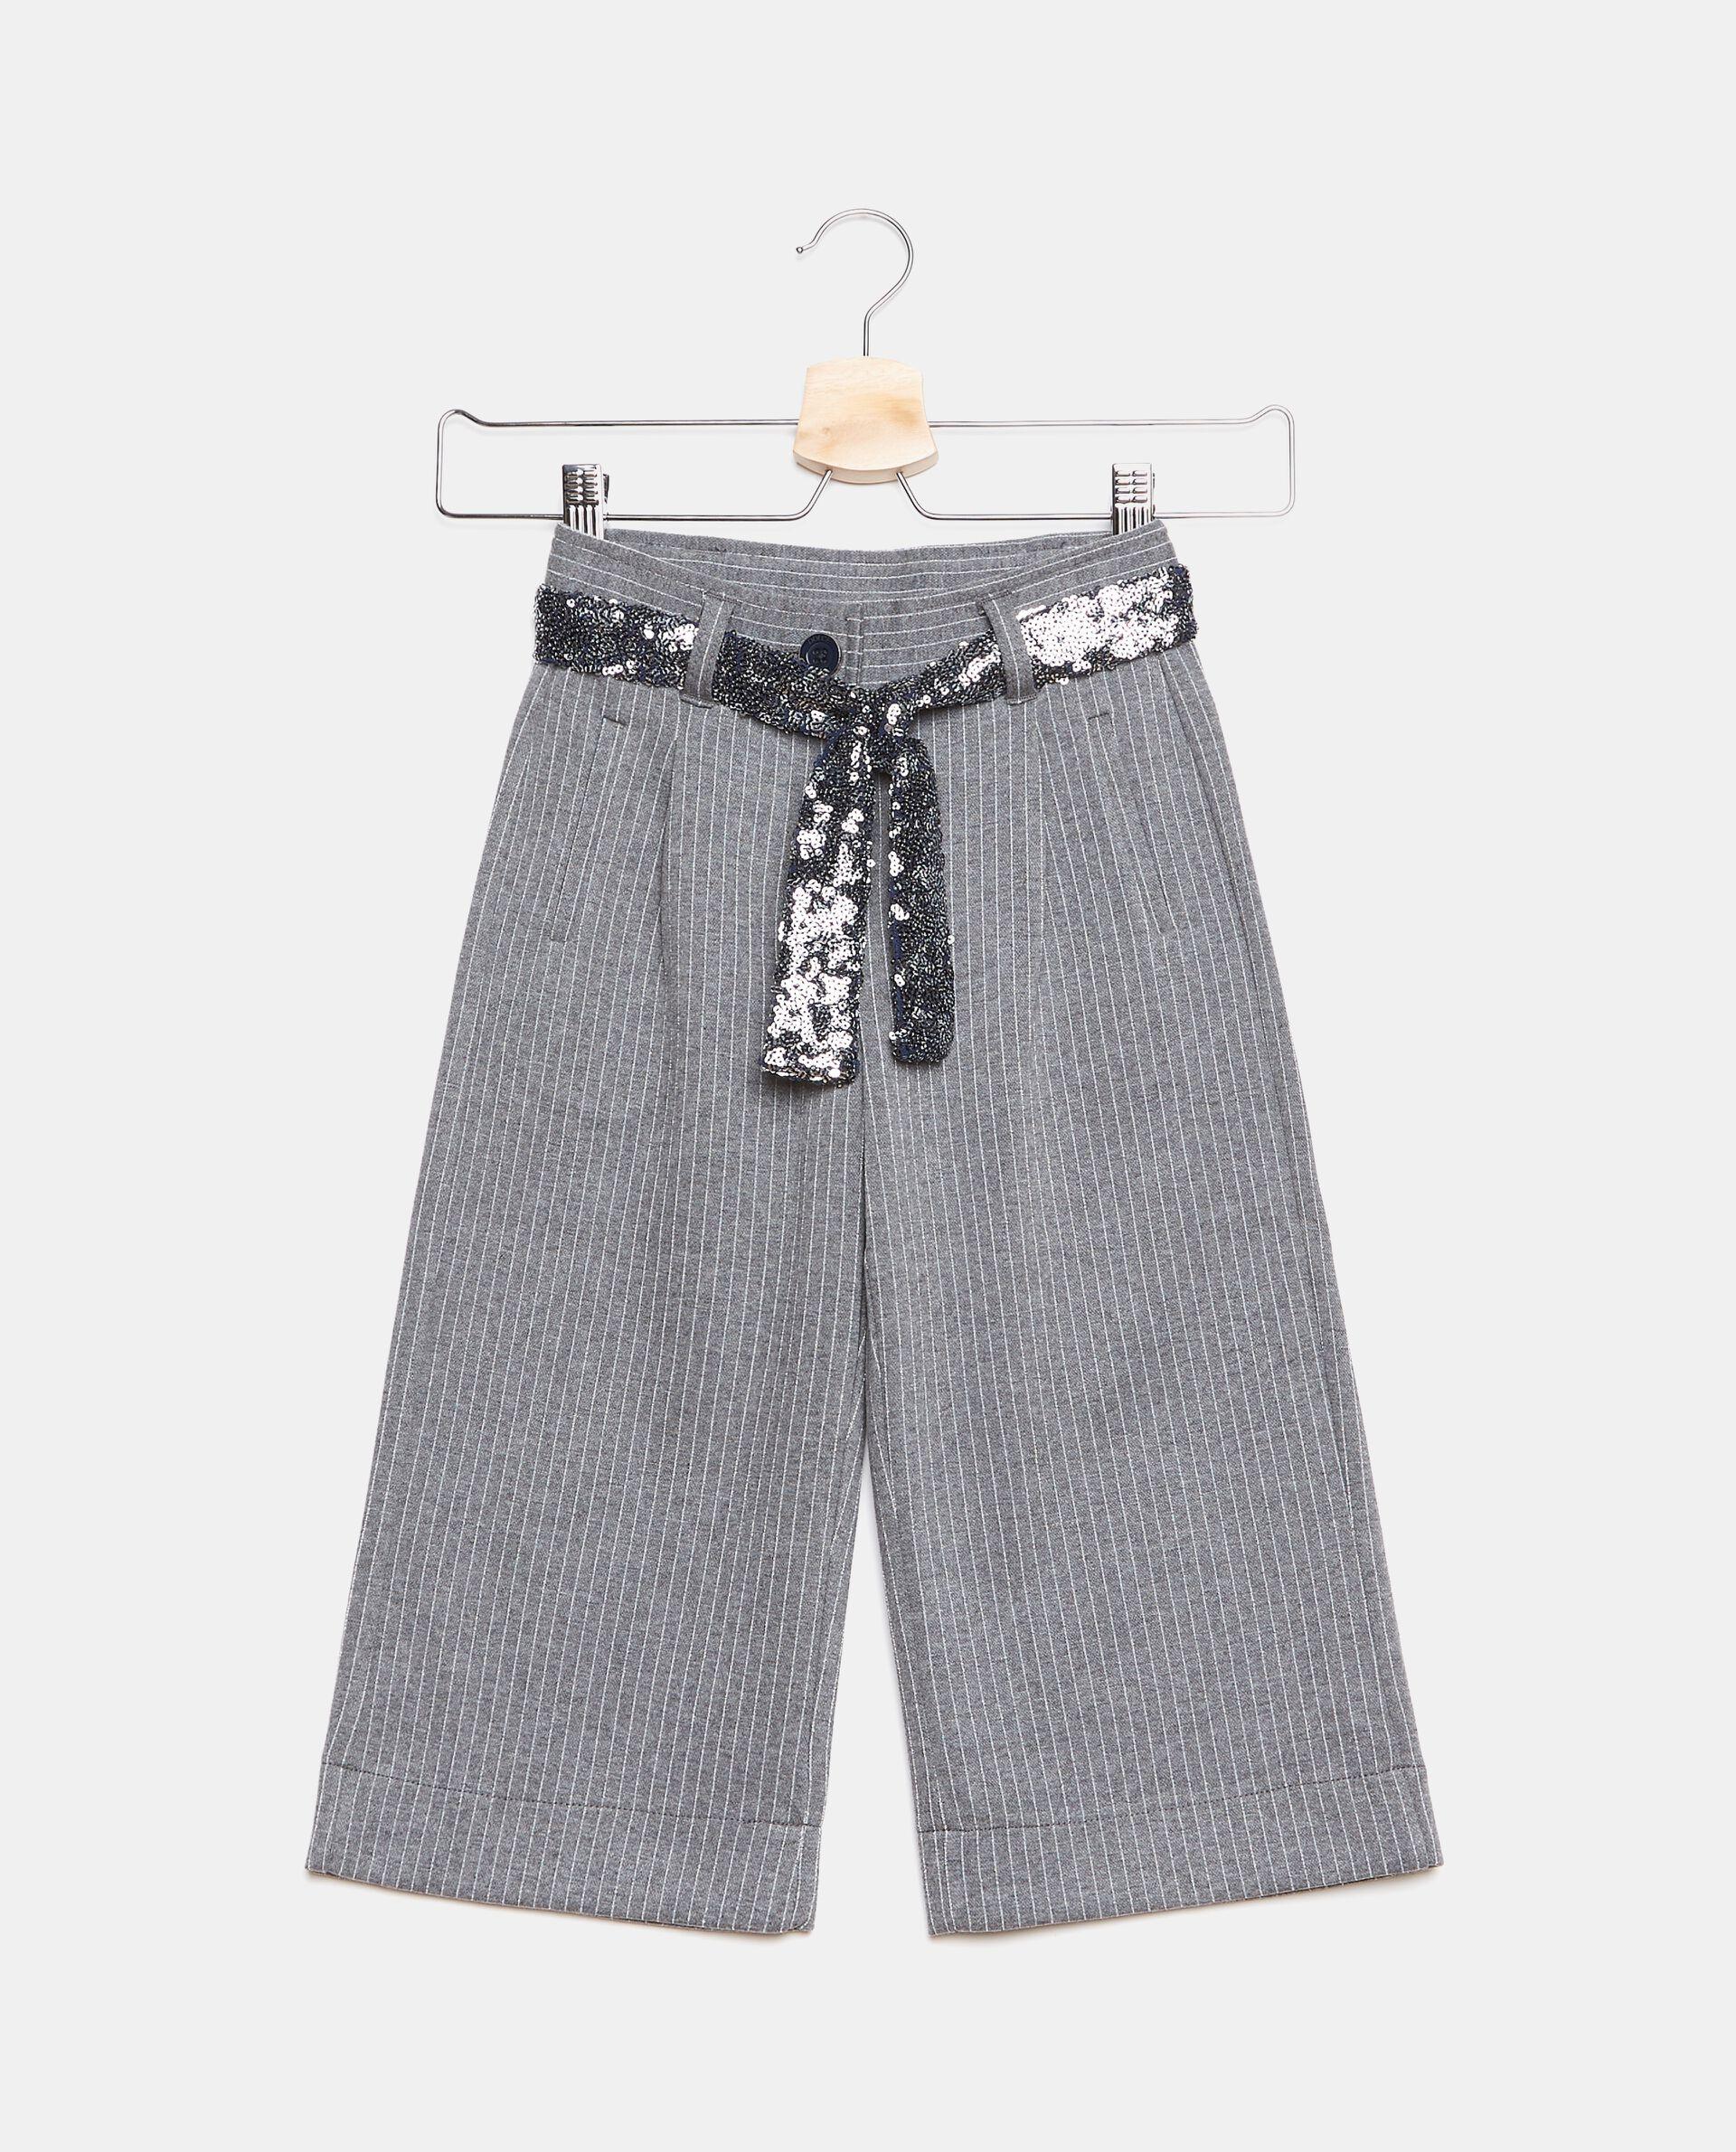 Pantaloni gessati con nastrino bambina